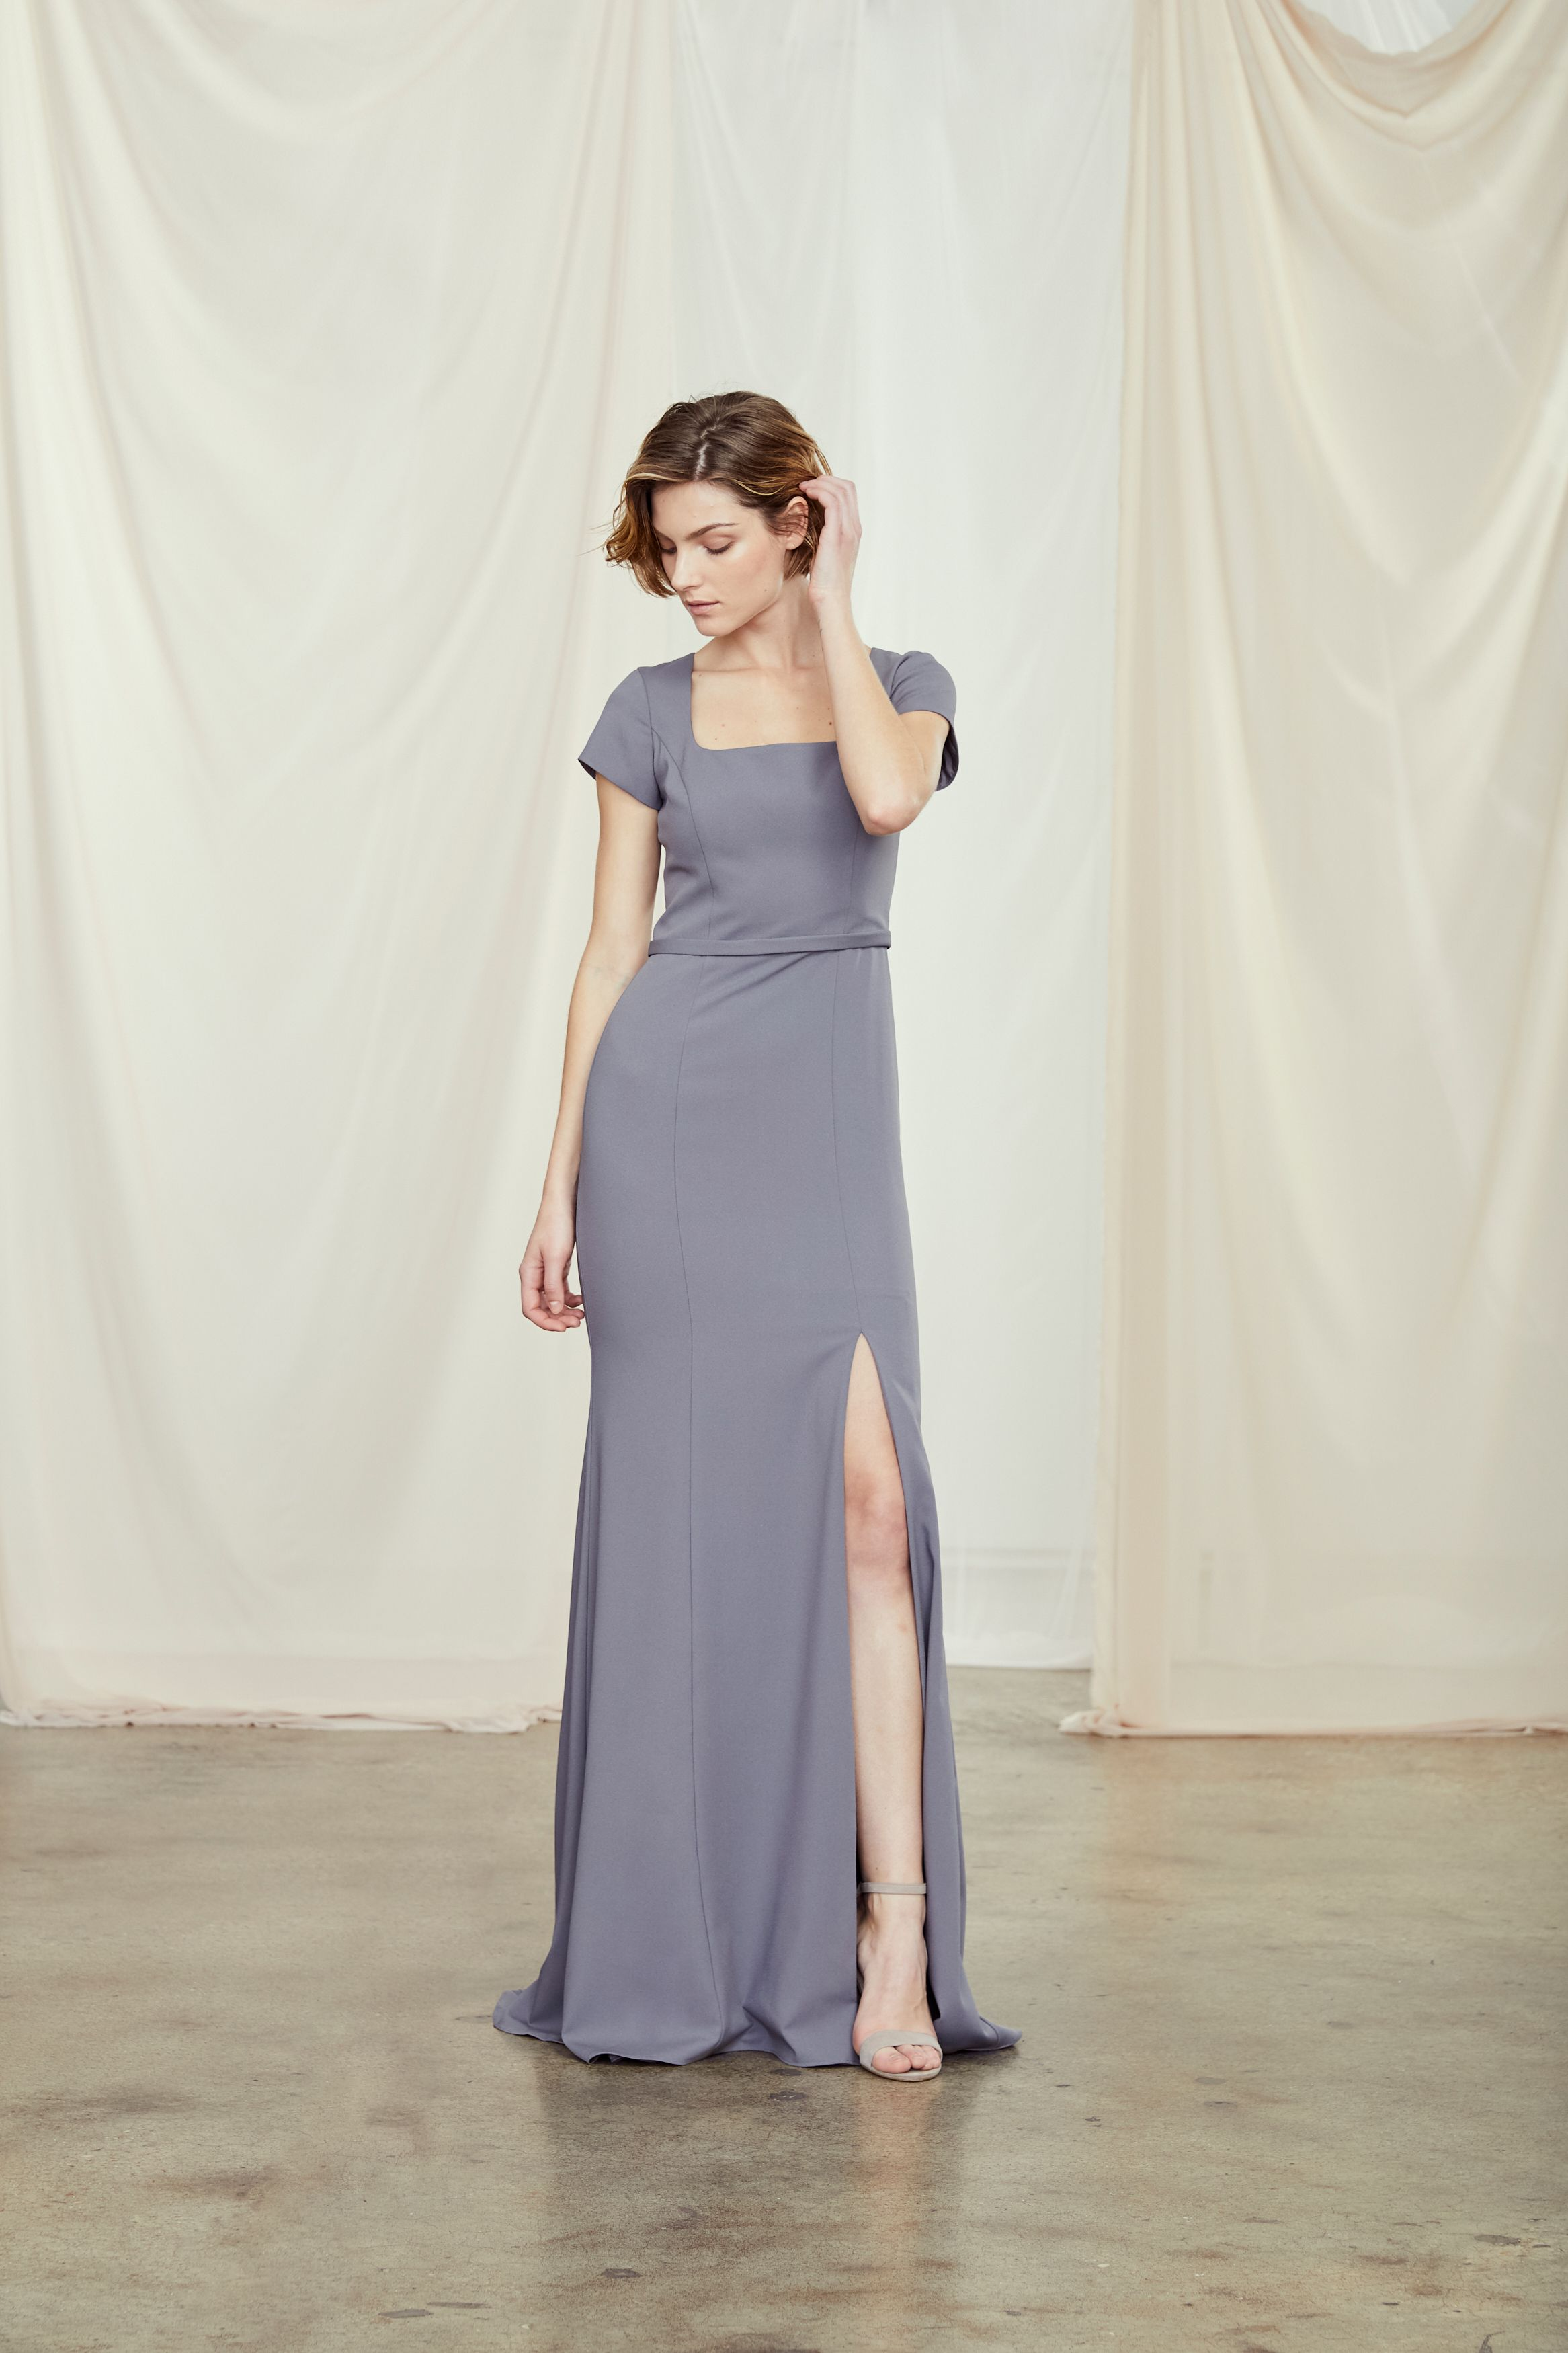 Cal square neckline dress amsale bridesmaid dresses